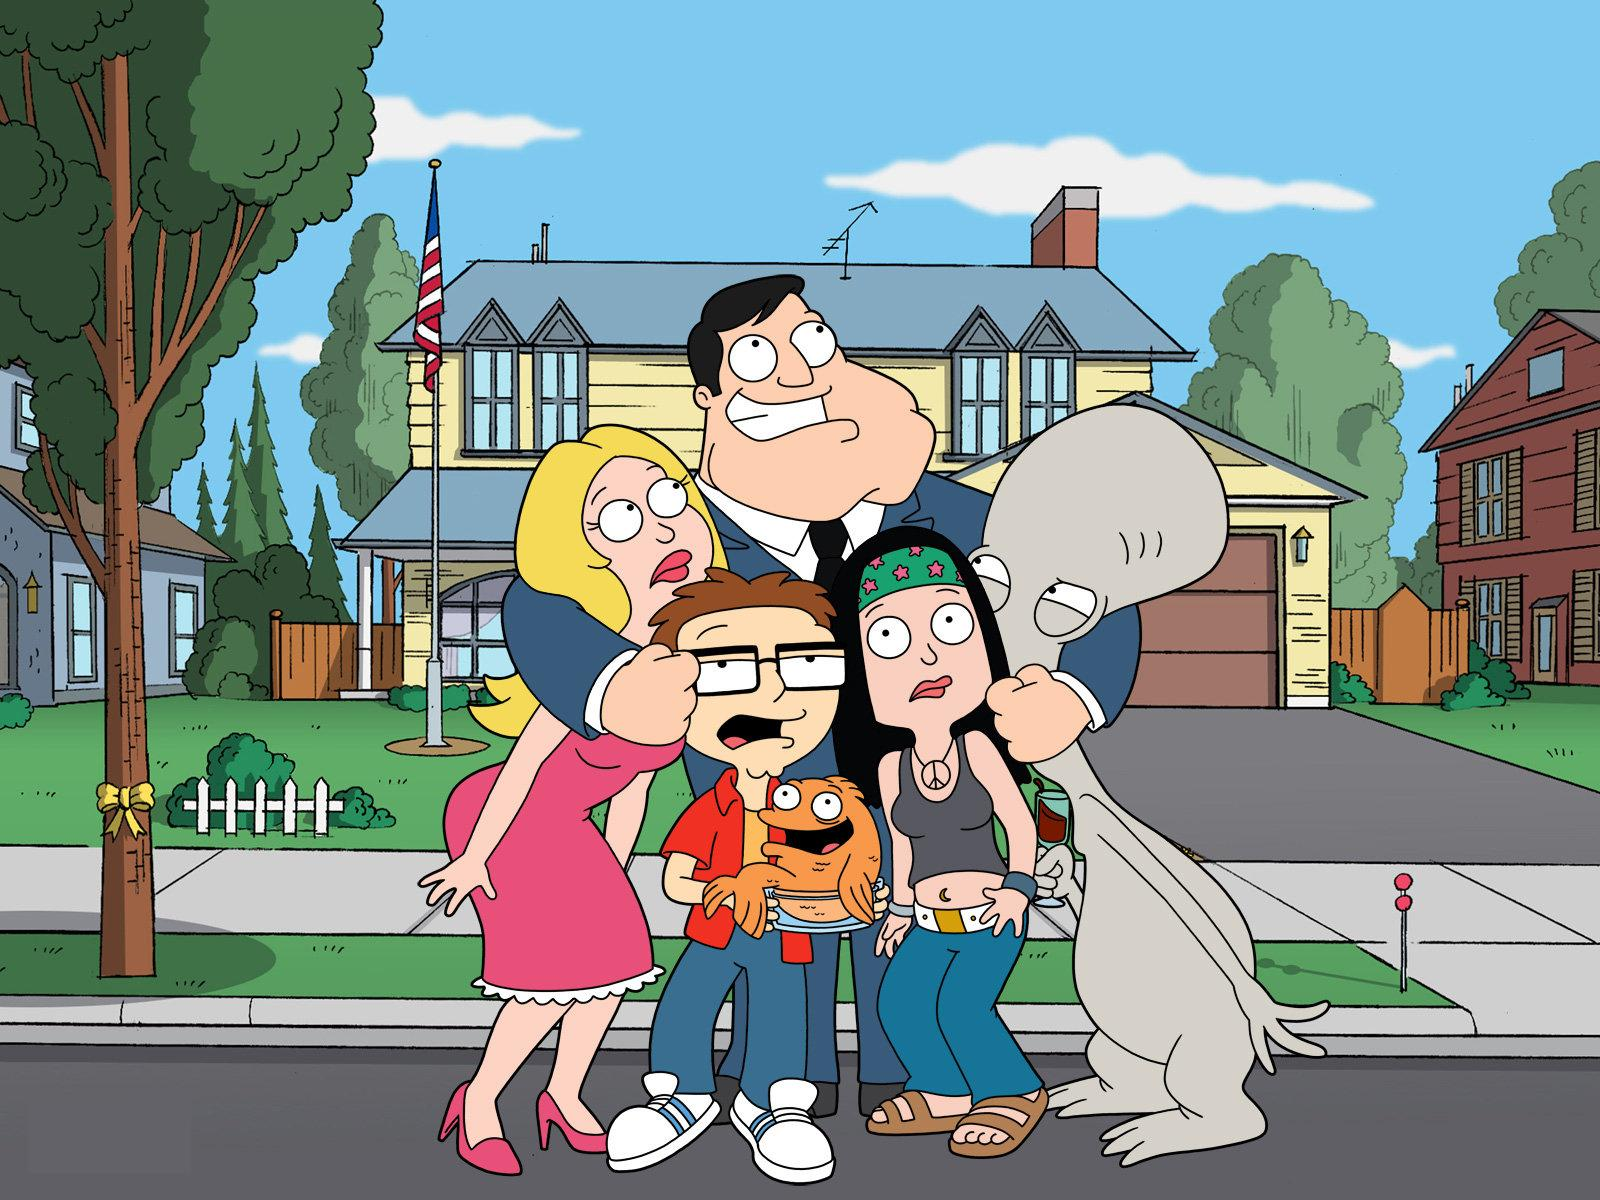 ver online American Dad, Padre De Familia, Futurama + yapa